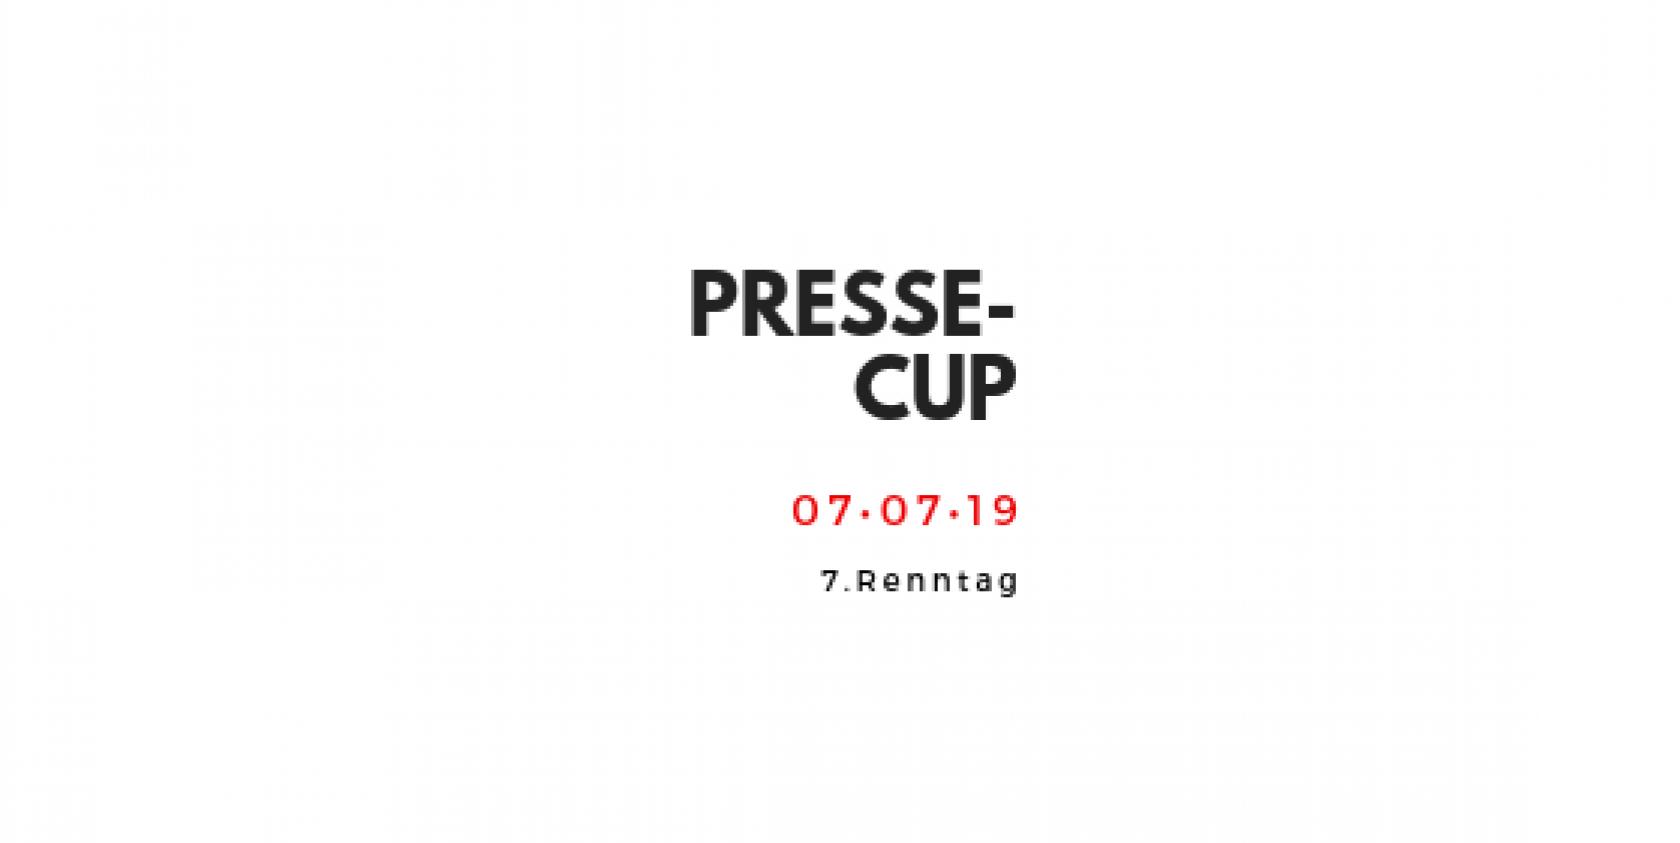 Pressecup 7. Renntag, Sontag 07. Juli 2019